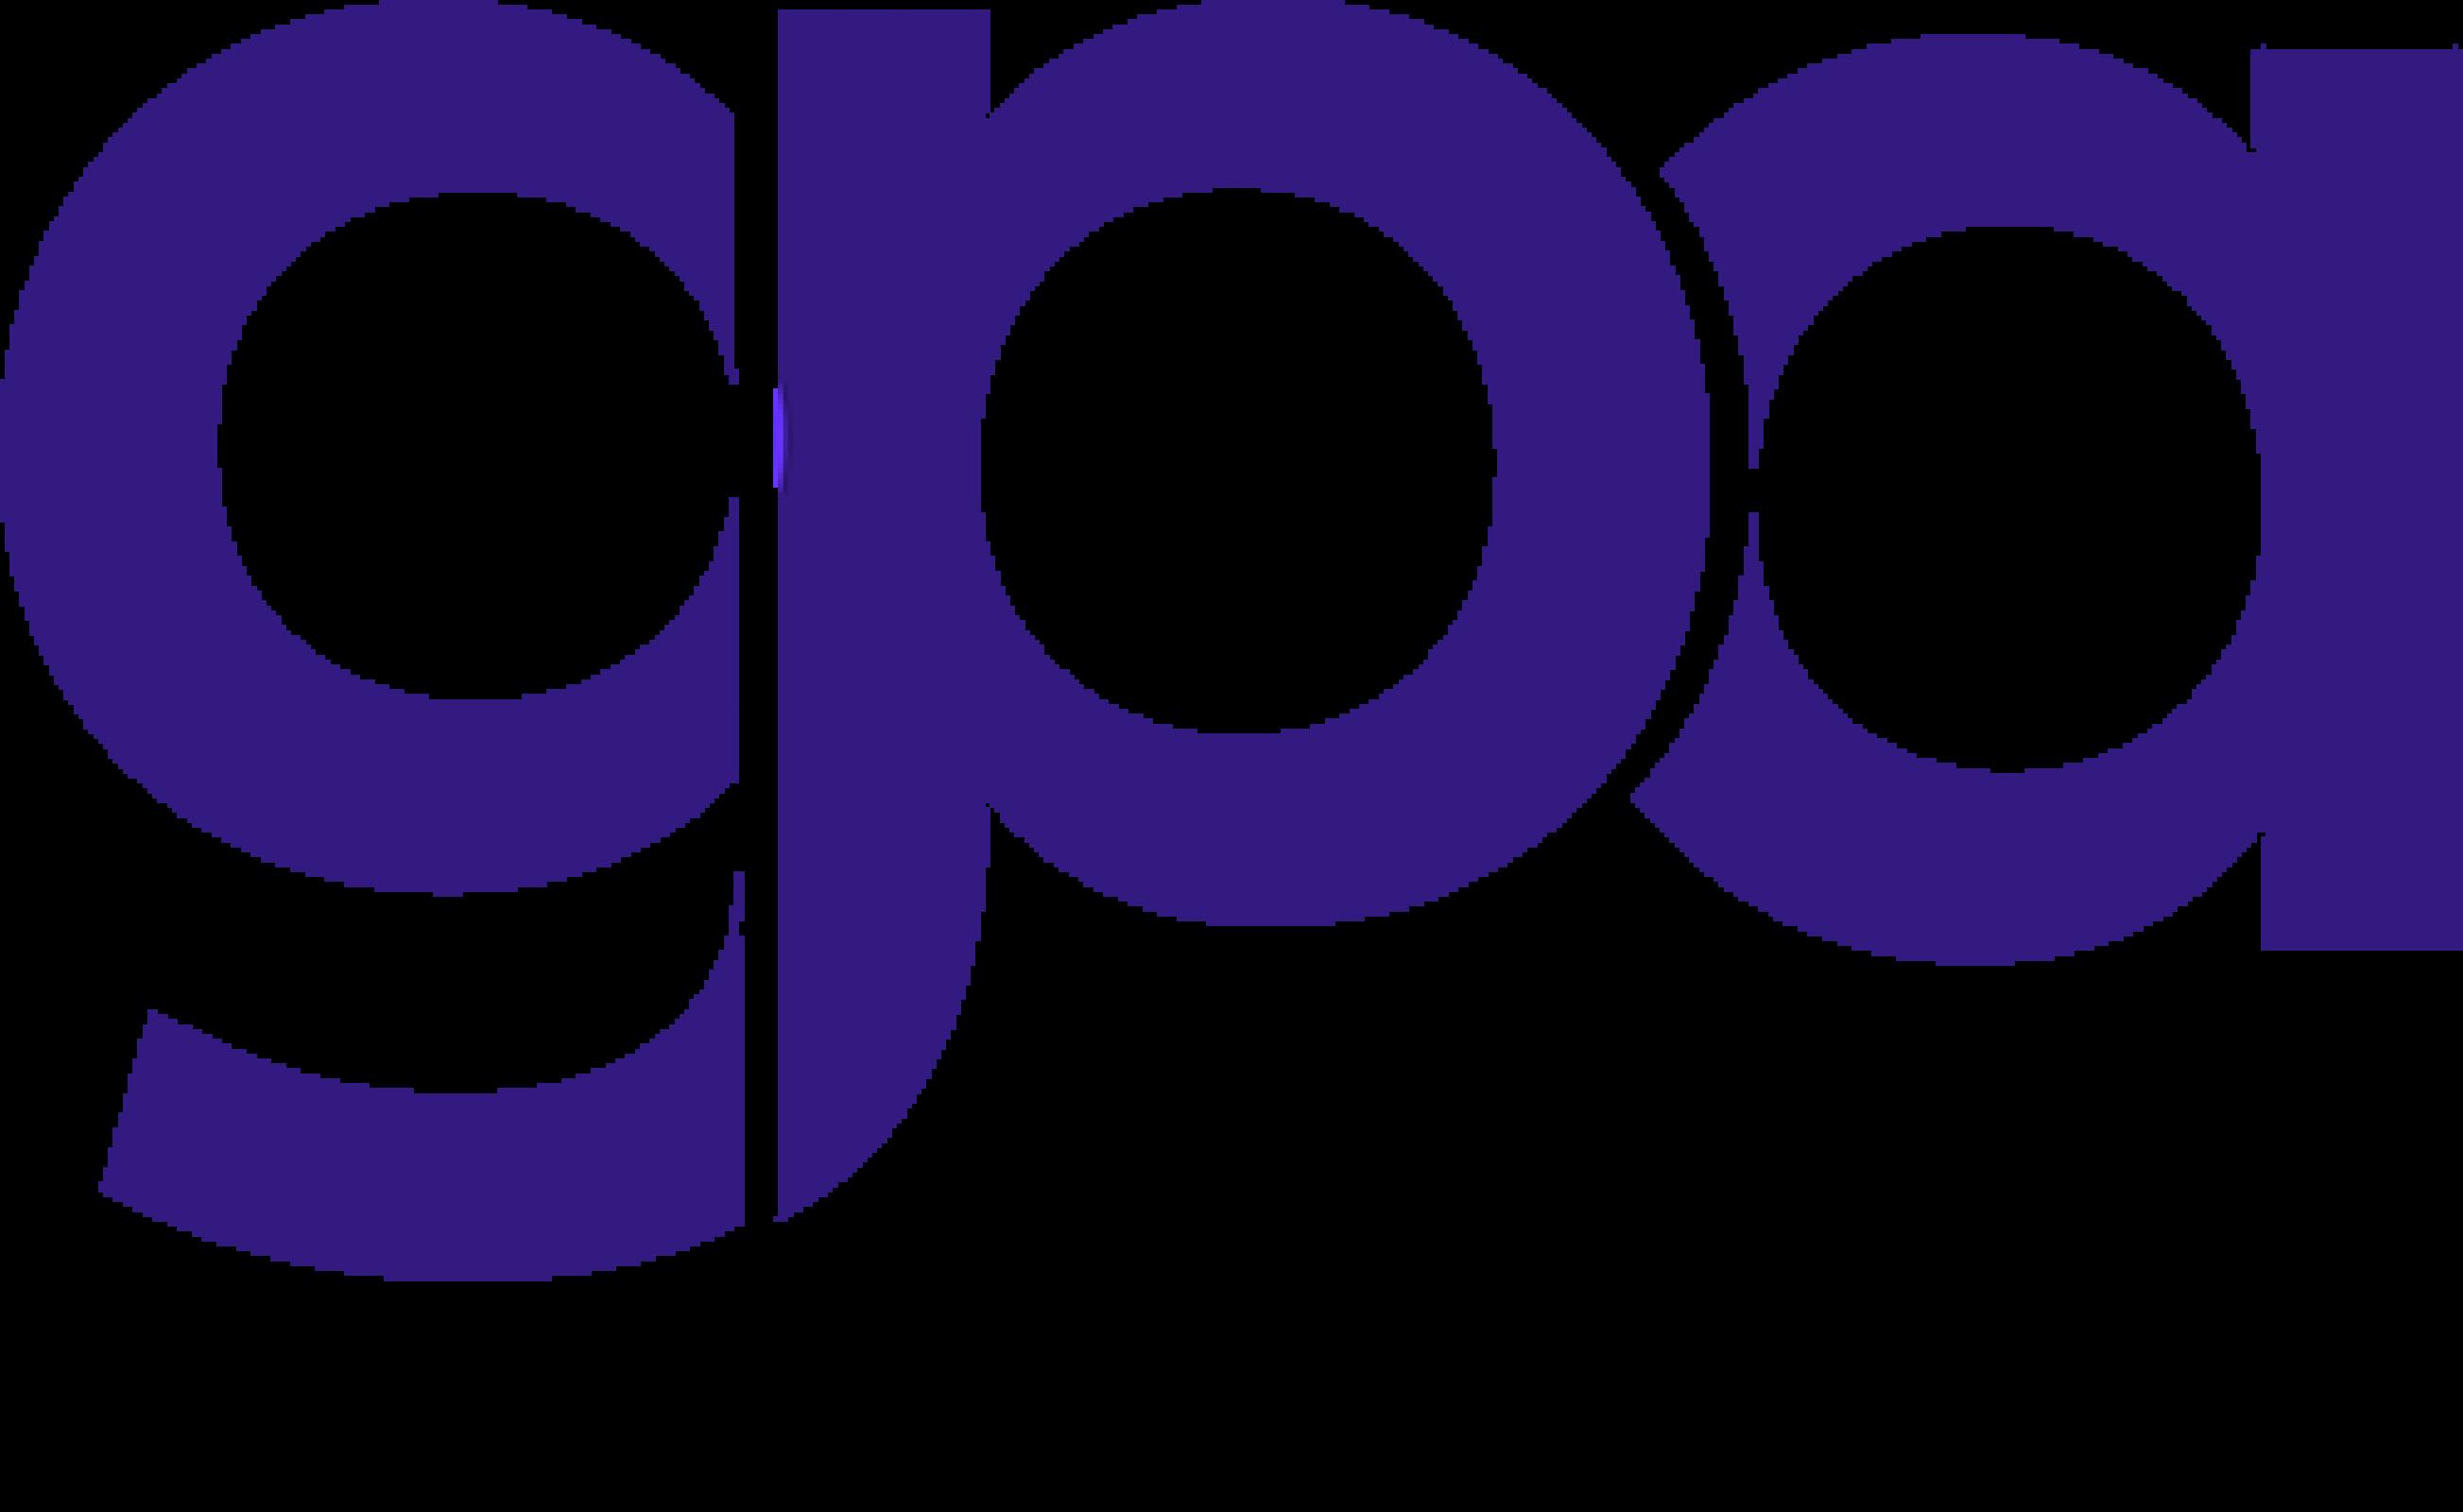 gpa logo 2048x